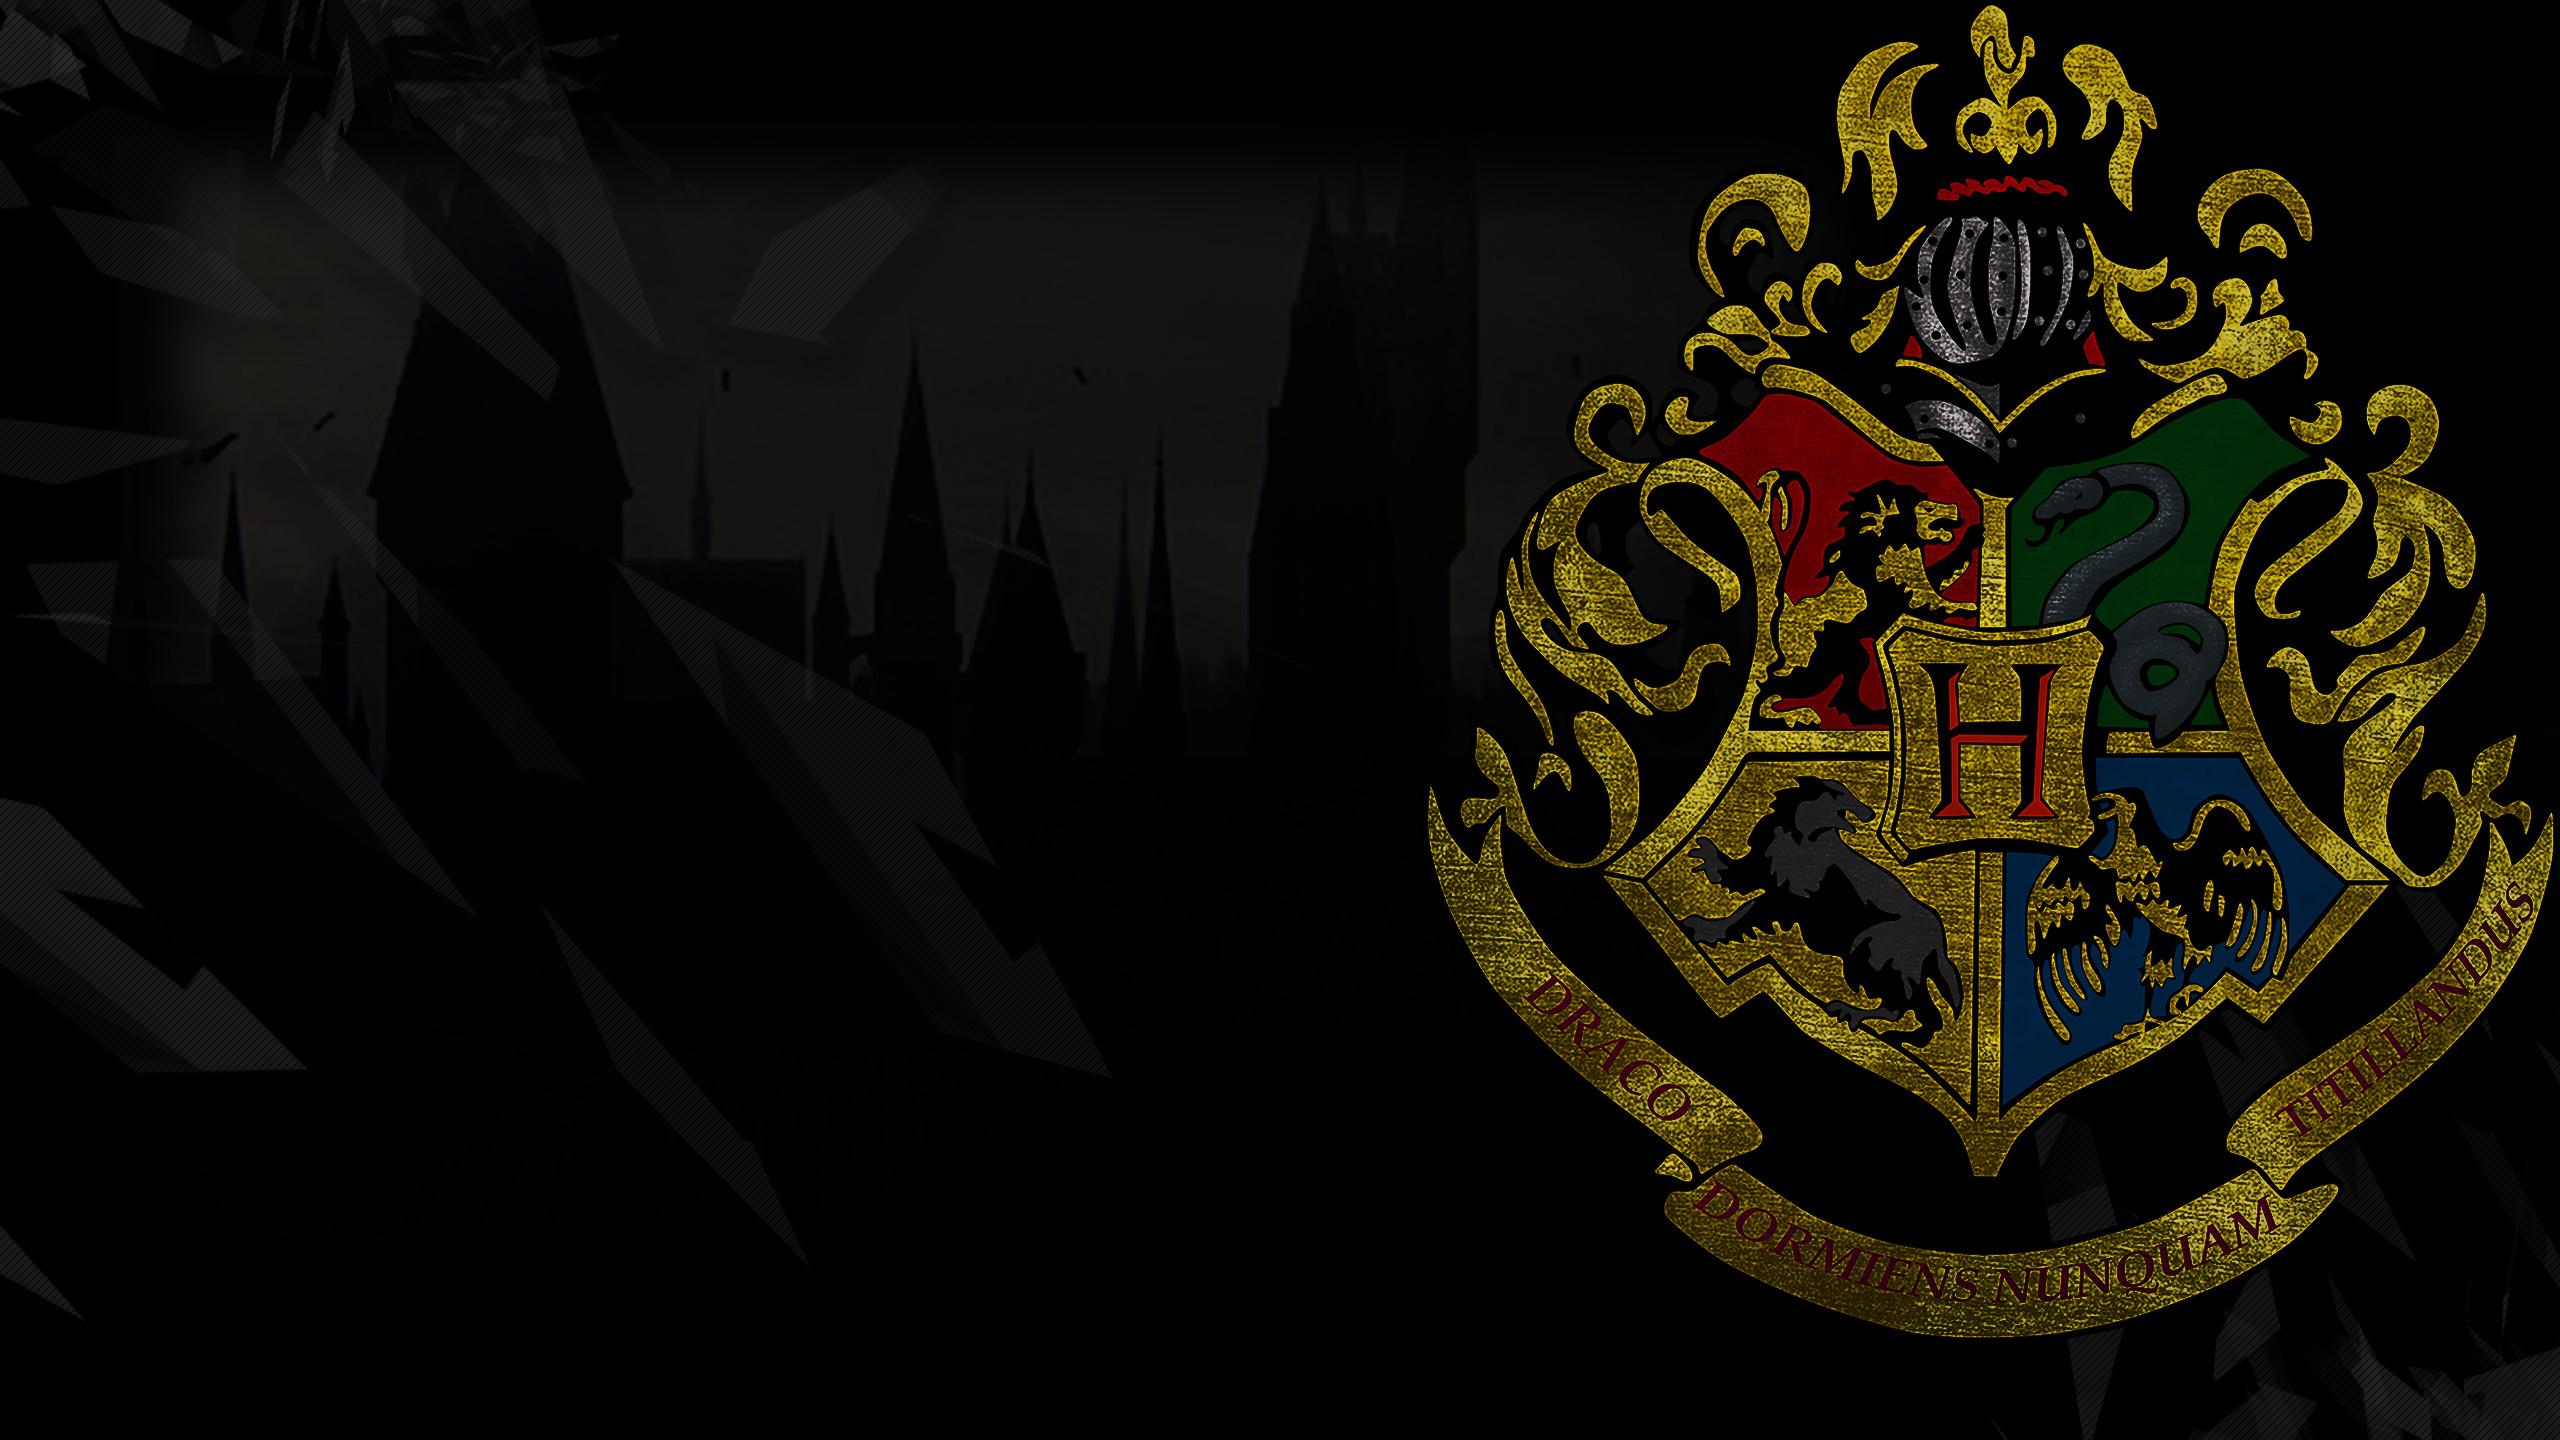 Amazing Wallpaper Harry Potter Apple - 31236  Graphic_502093.jpg